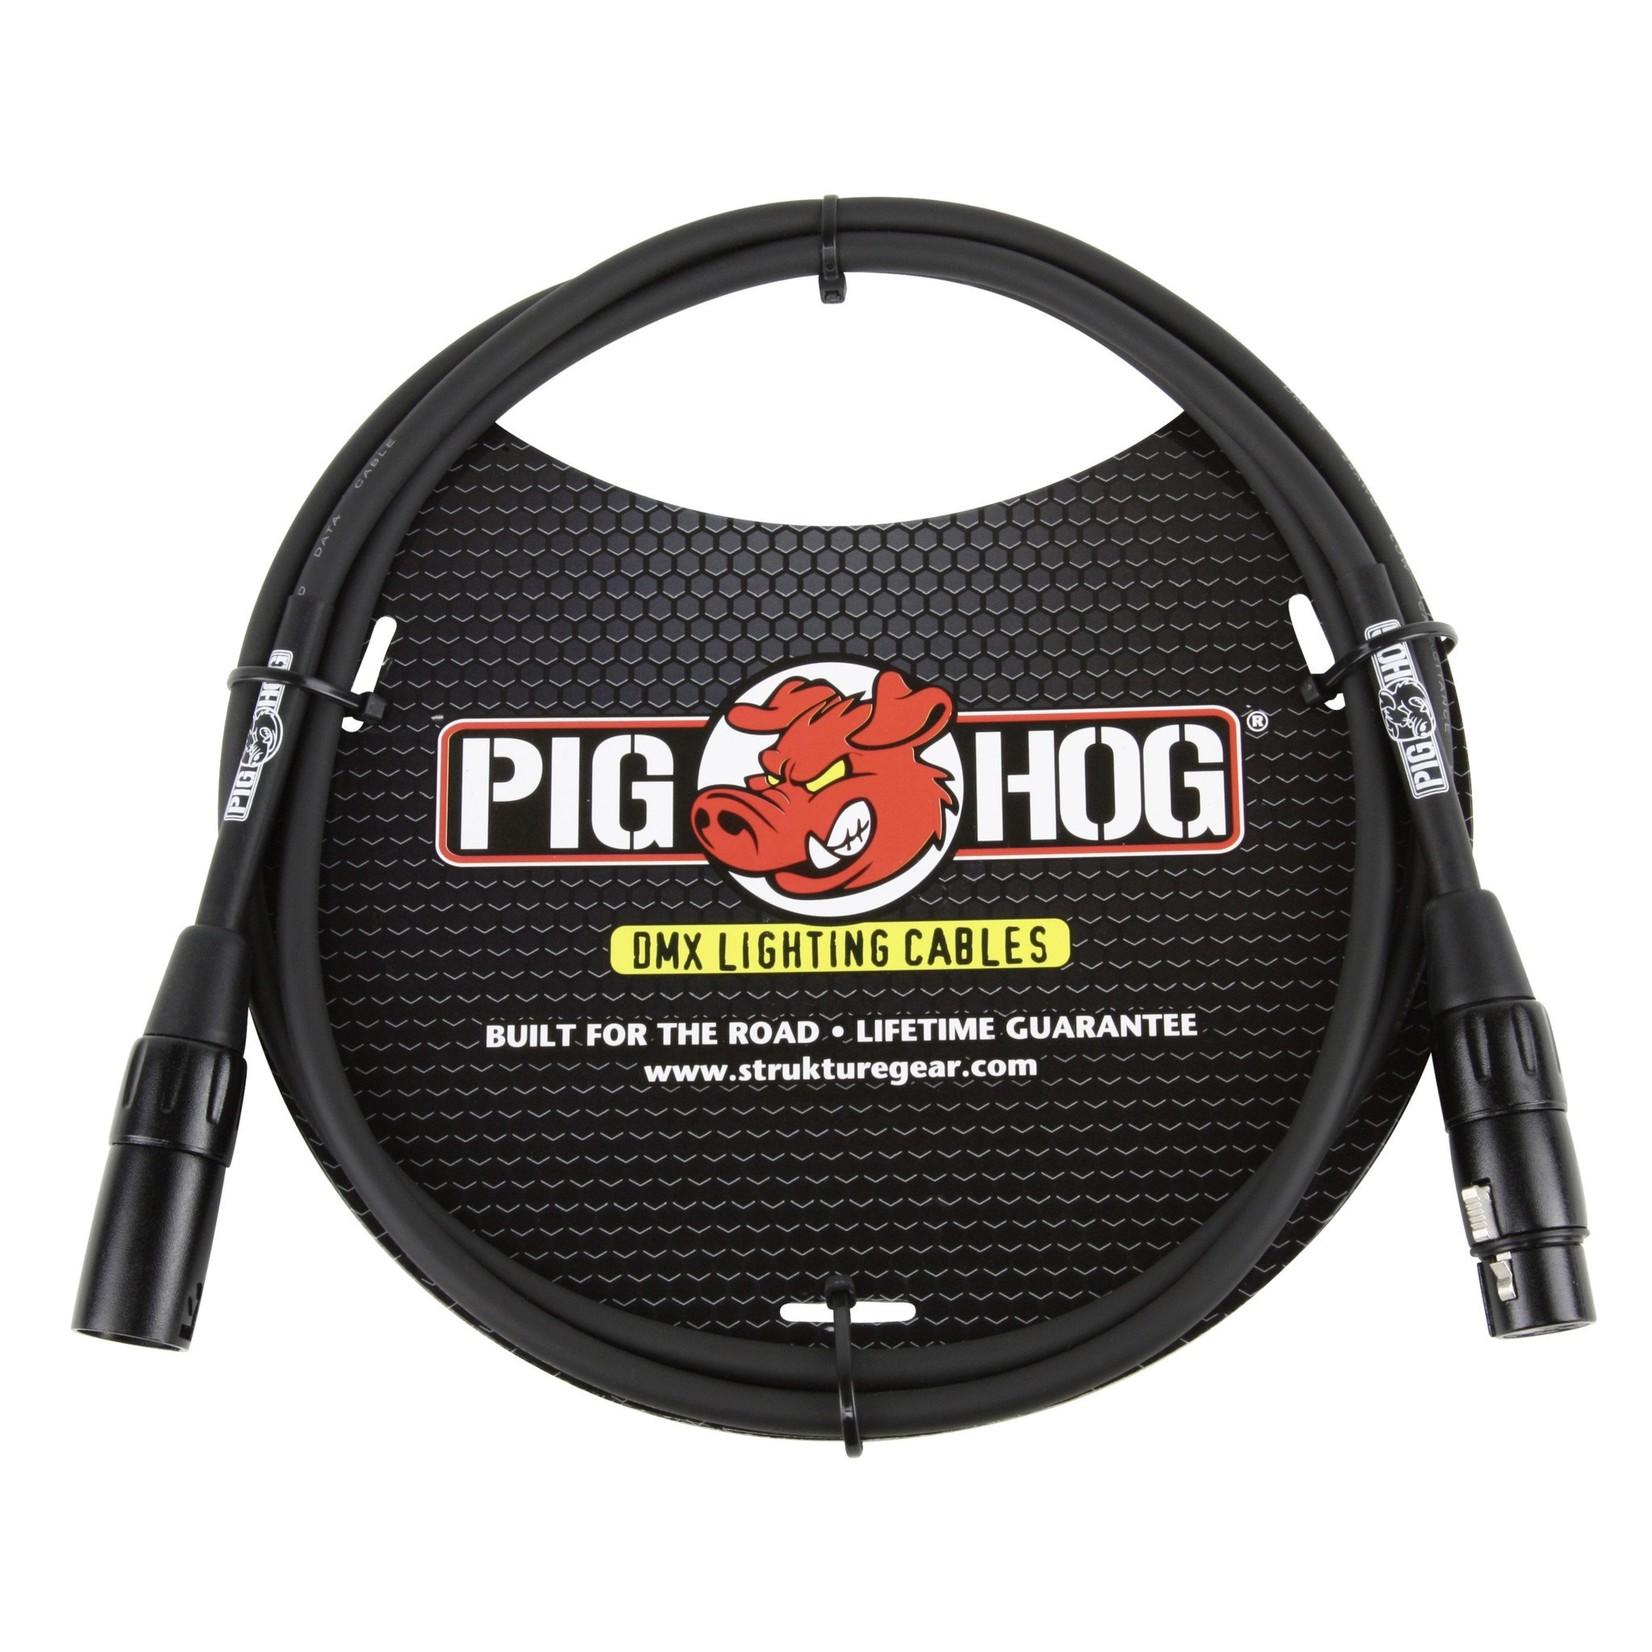 Pig Hog Pig Hog 5-foot, 3-Pin DMX Lighting Cable (PHDMX5)